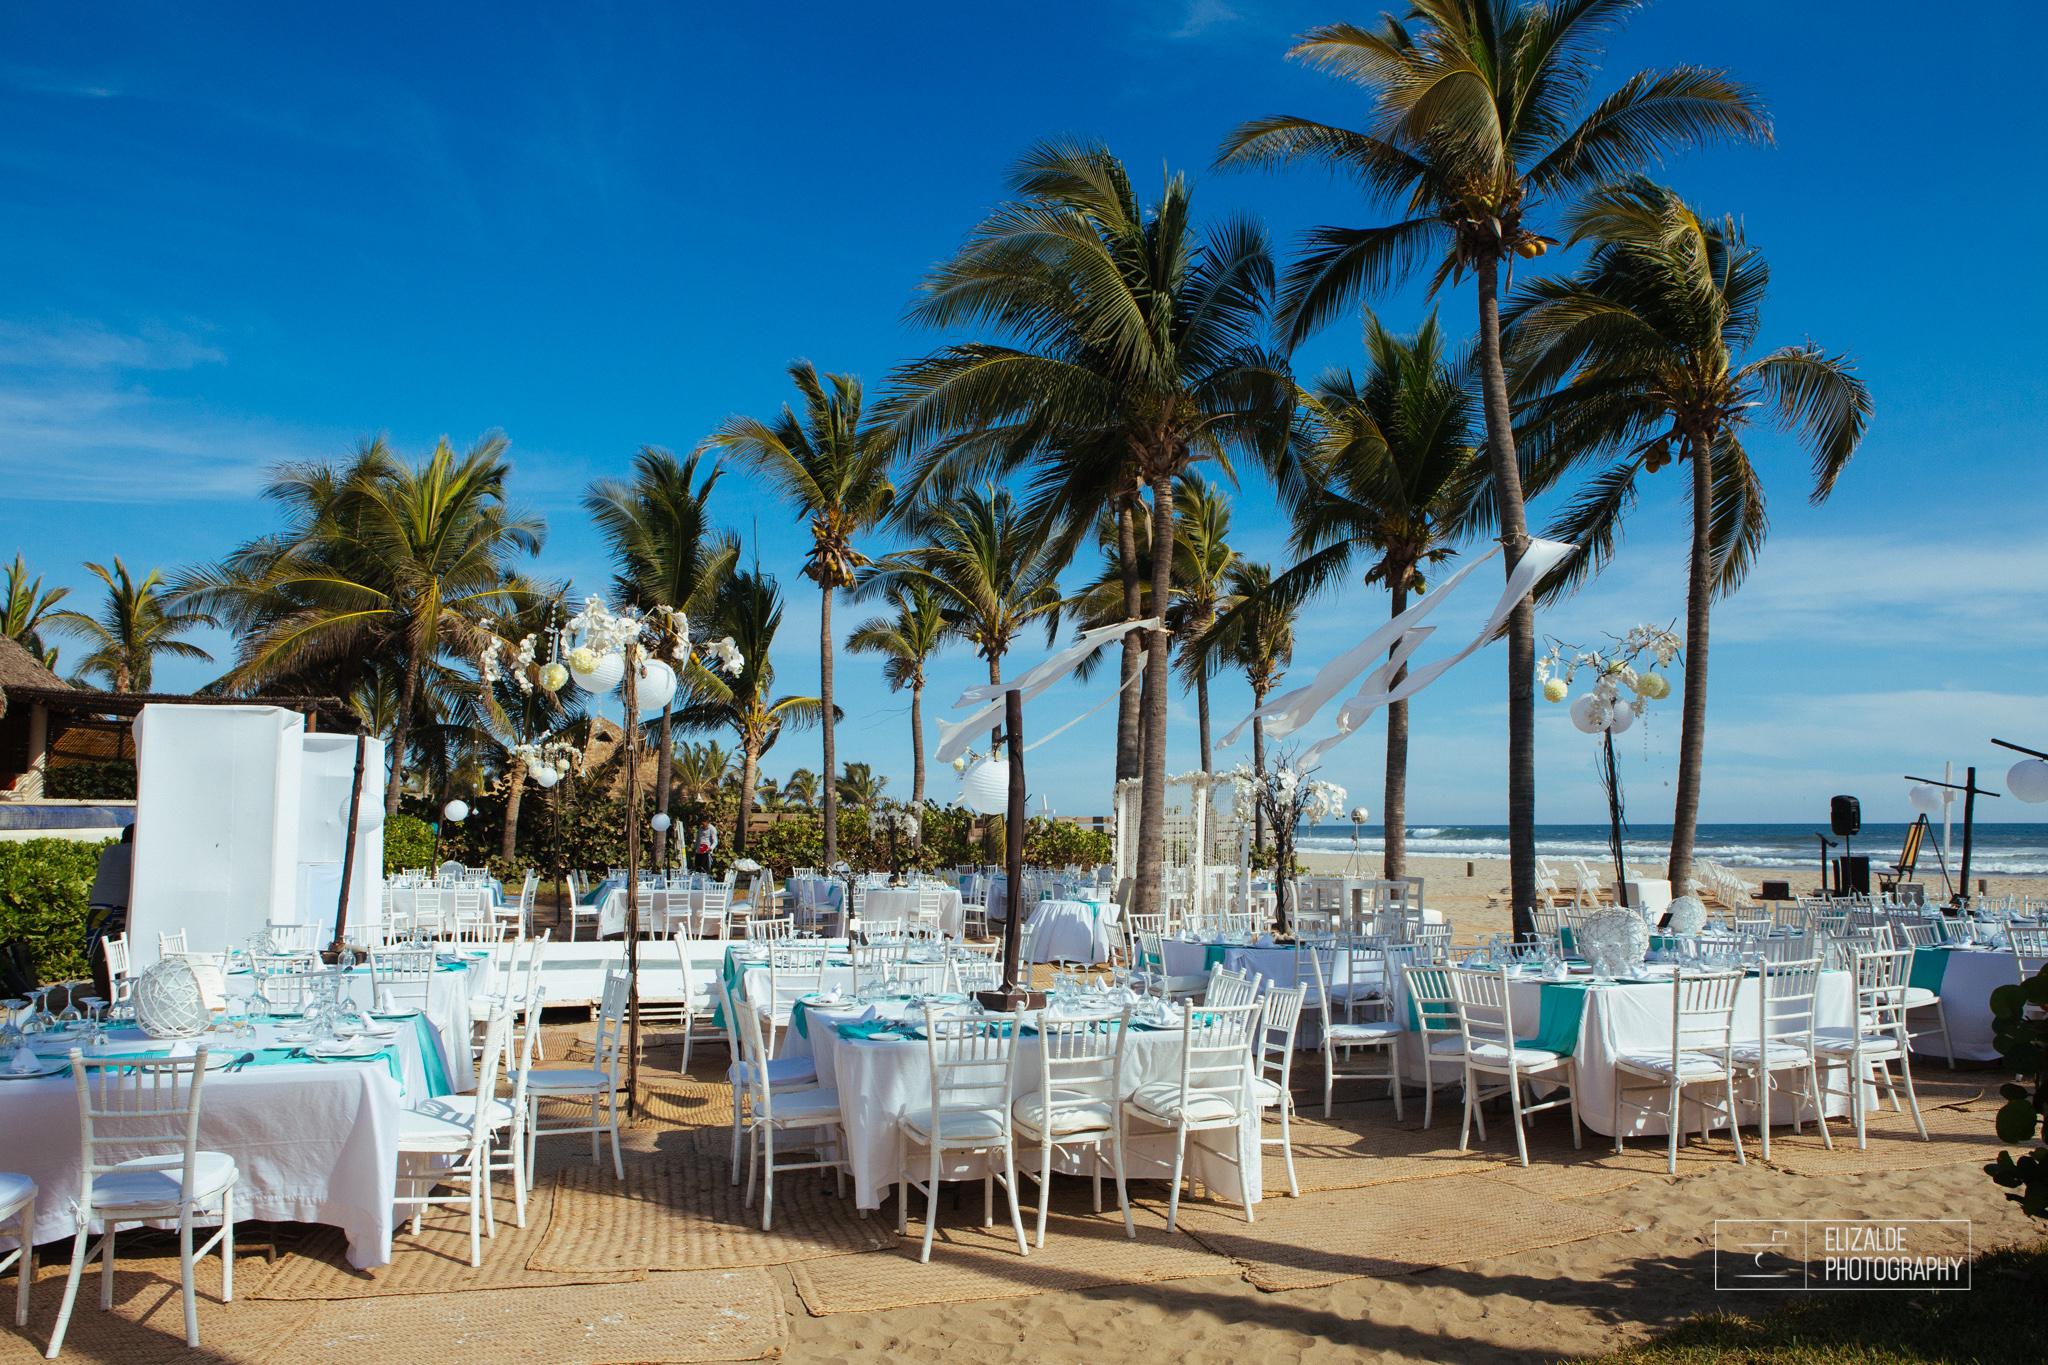 Pay and Ferran_Acapulco_Destination Wedding_Elizalde Photography-33.jpg